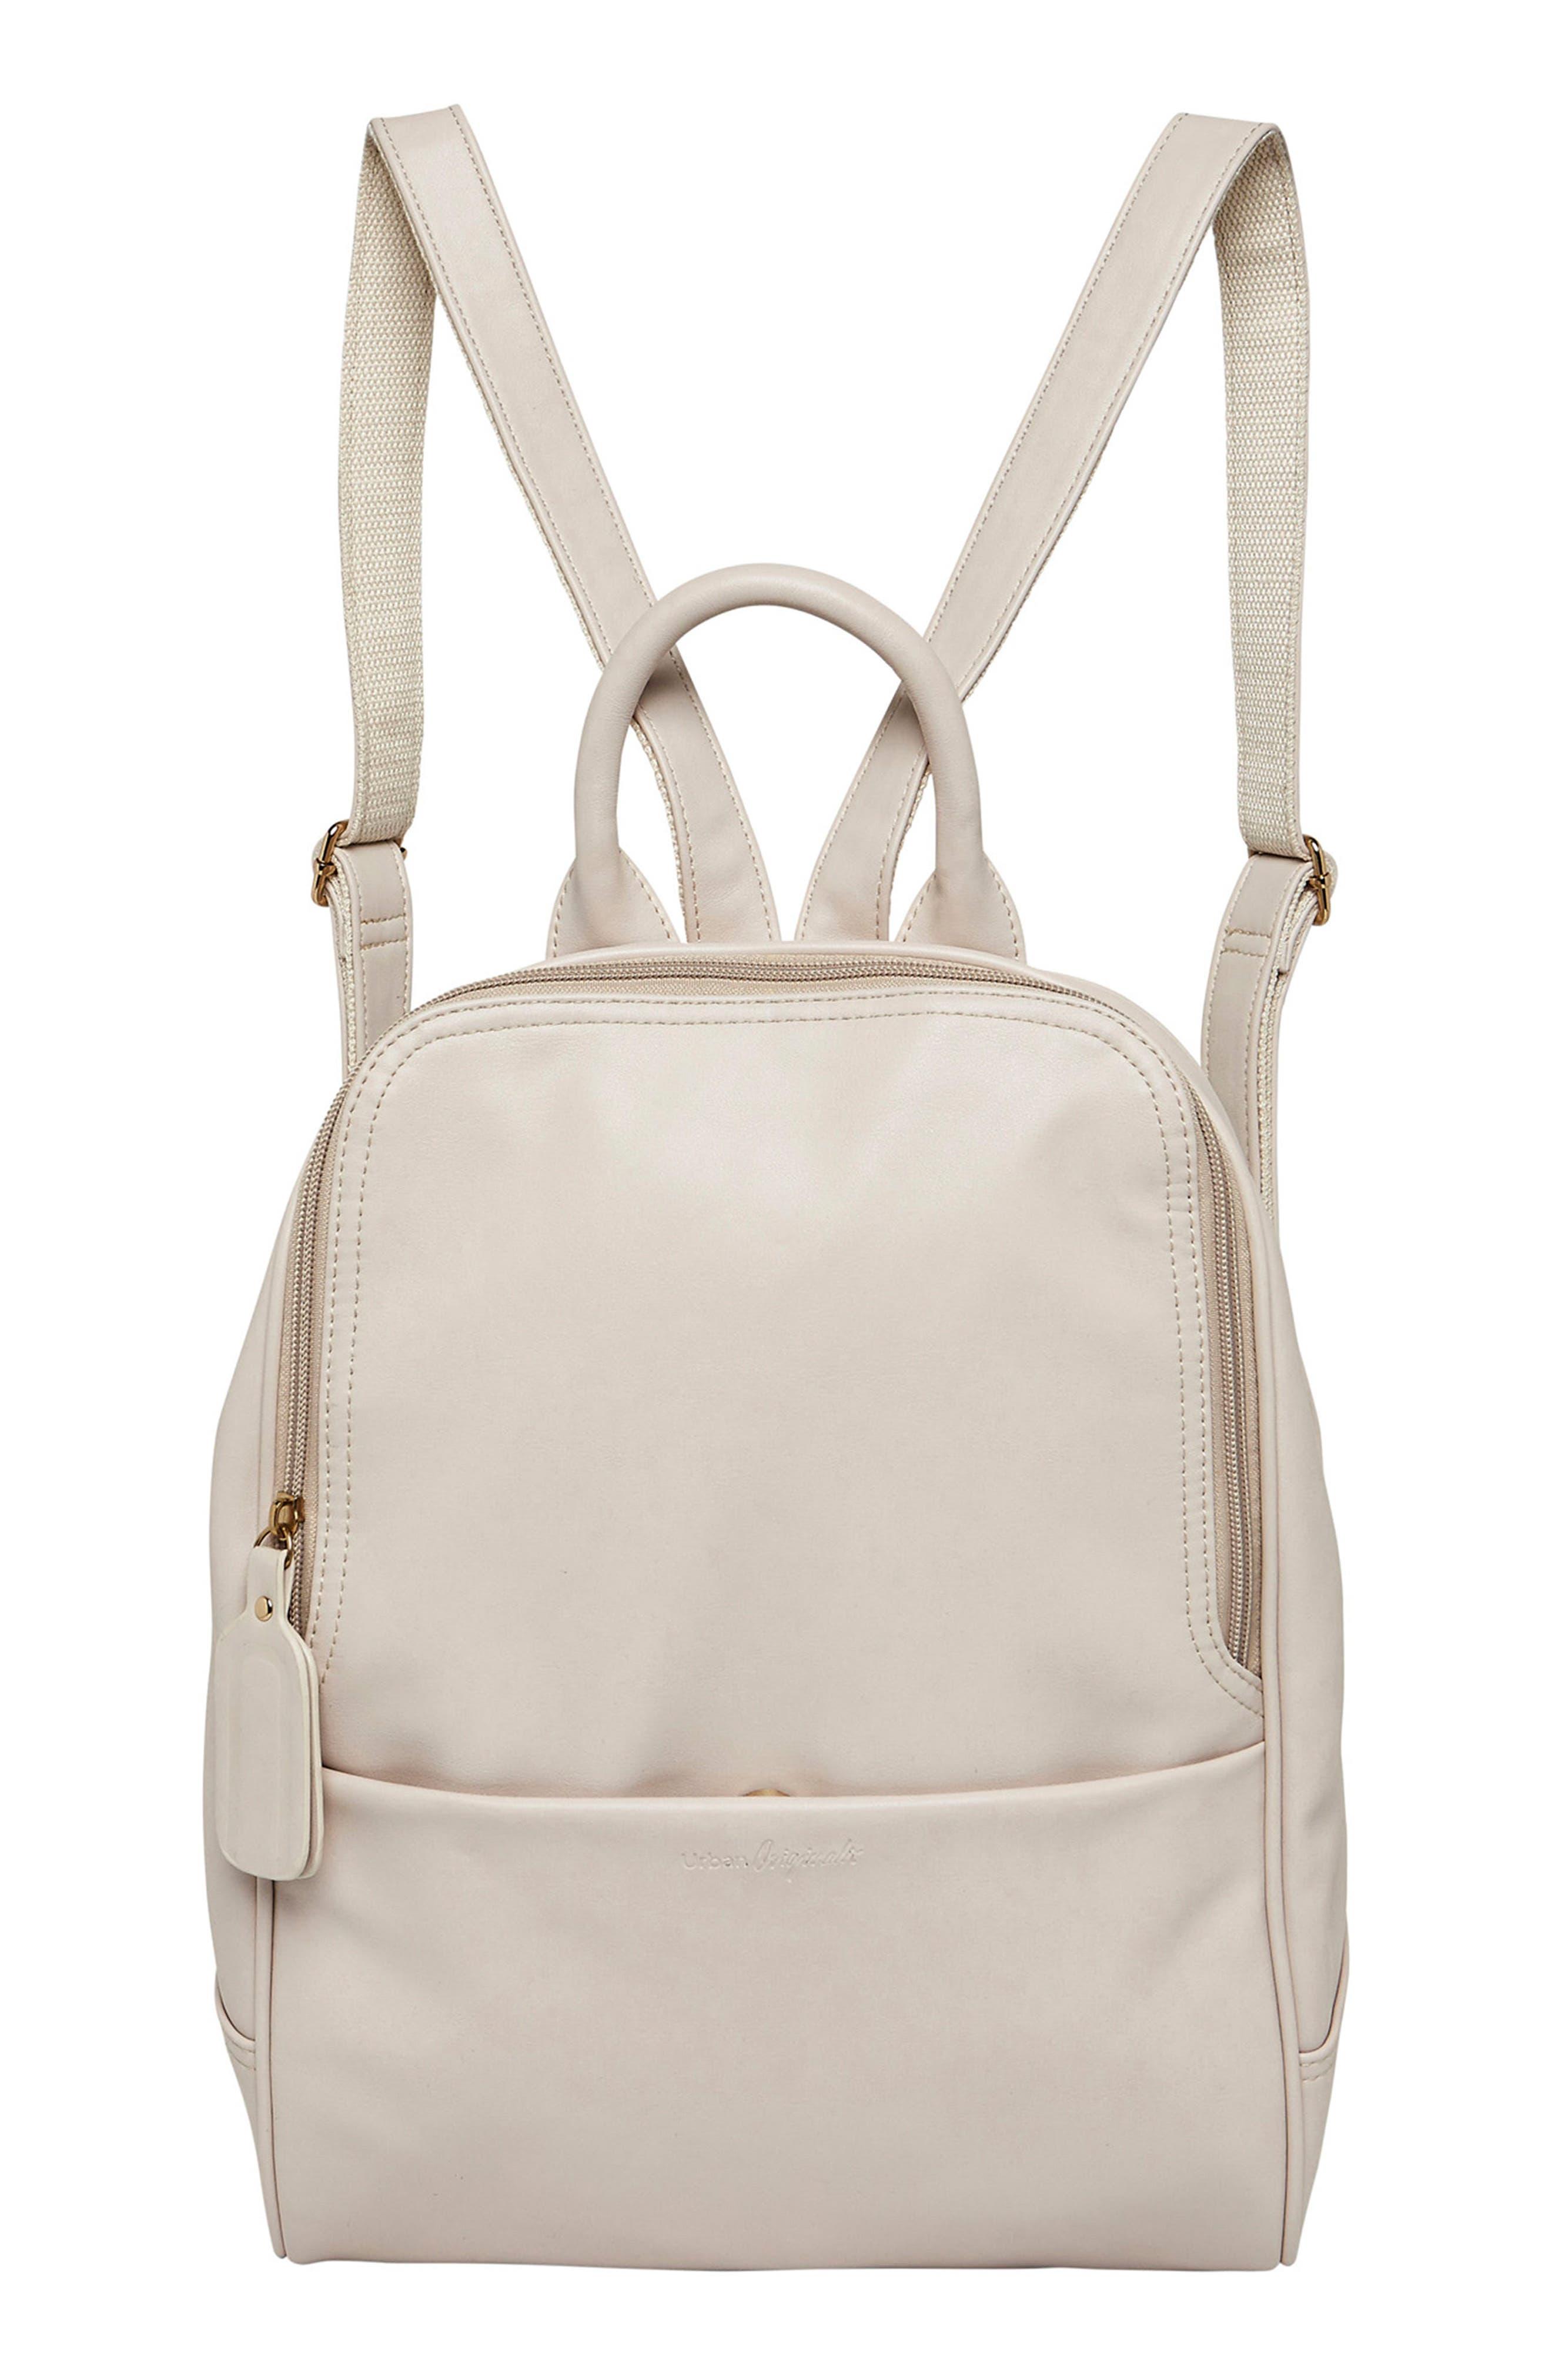 Evolution Vegan Leather Backpack,                             Main thumbnail 1, color,                             White